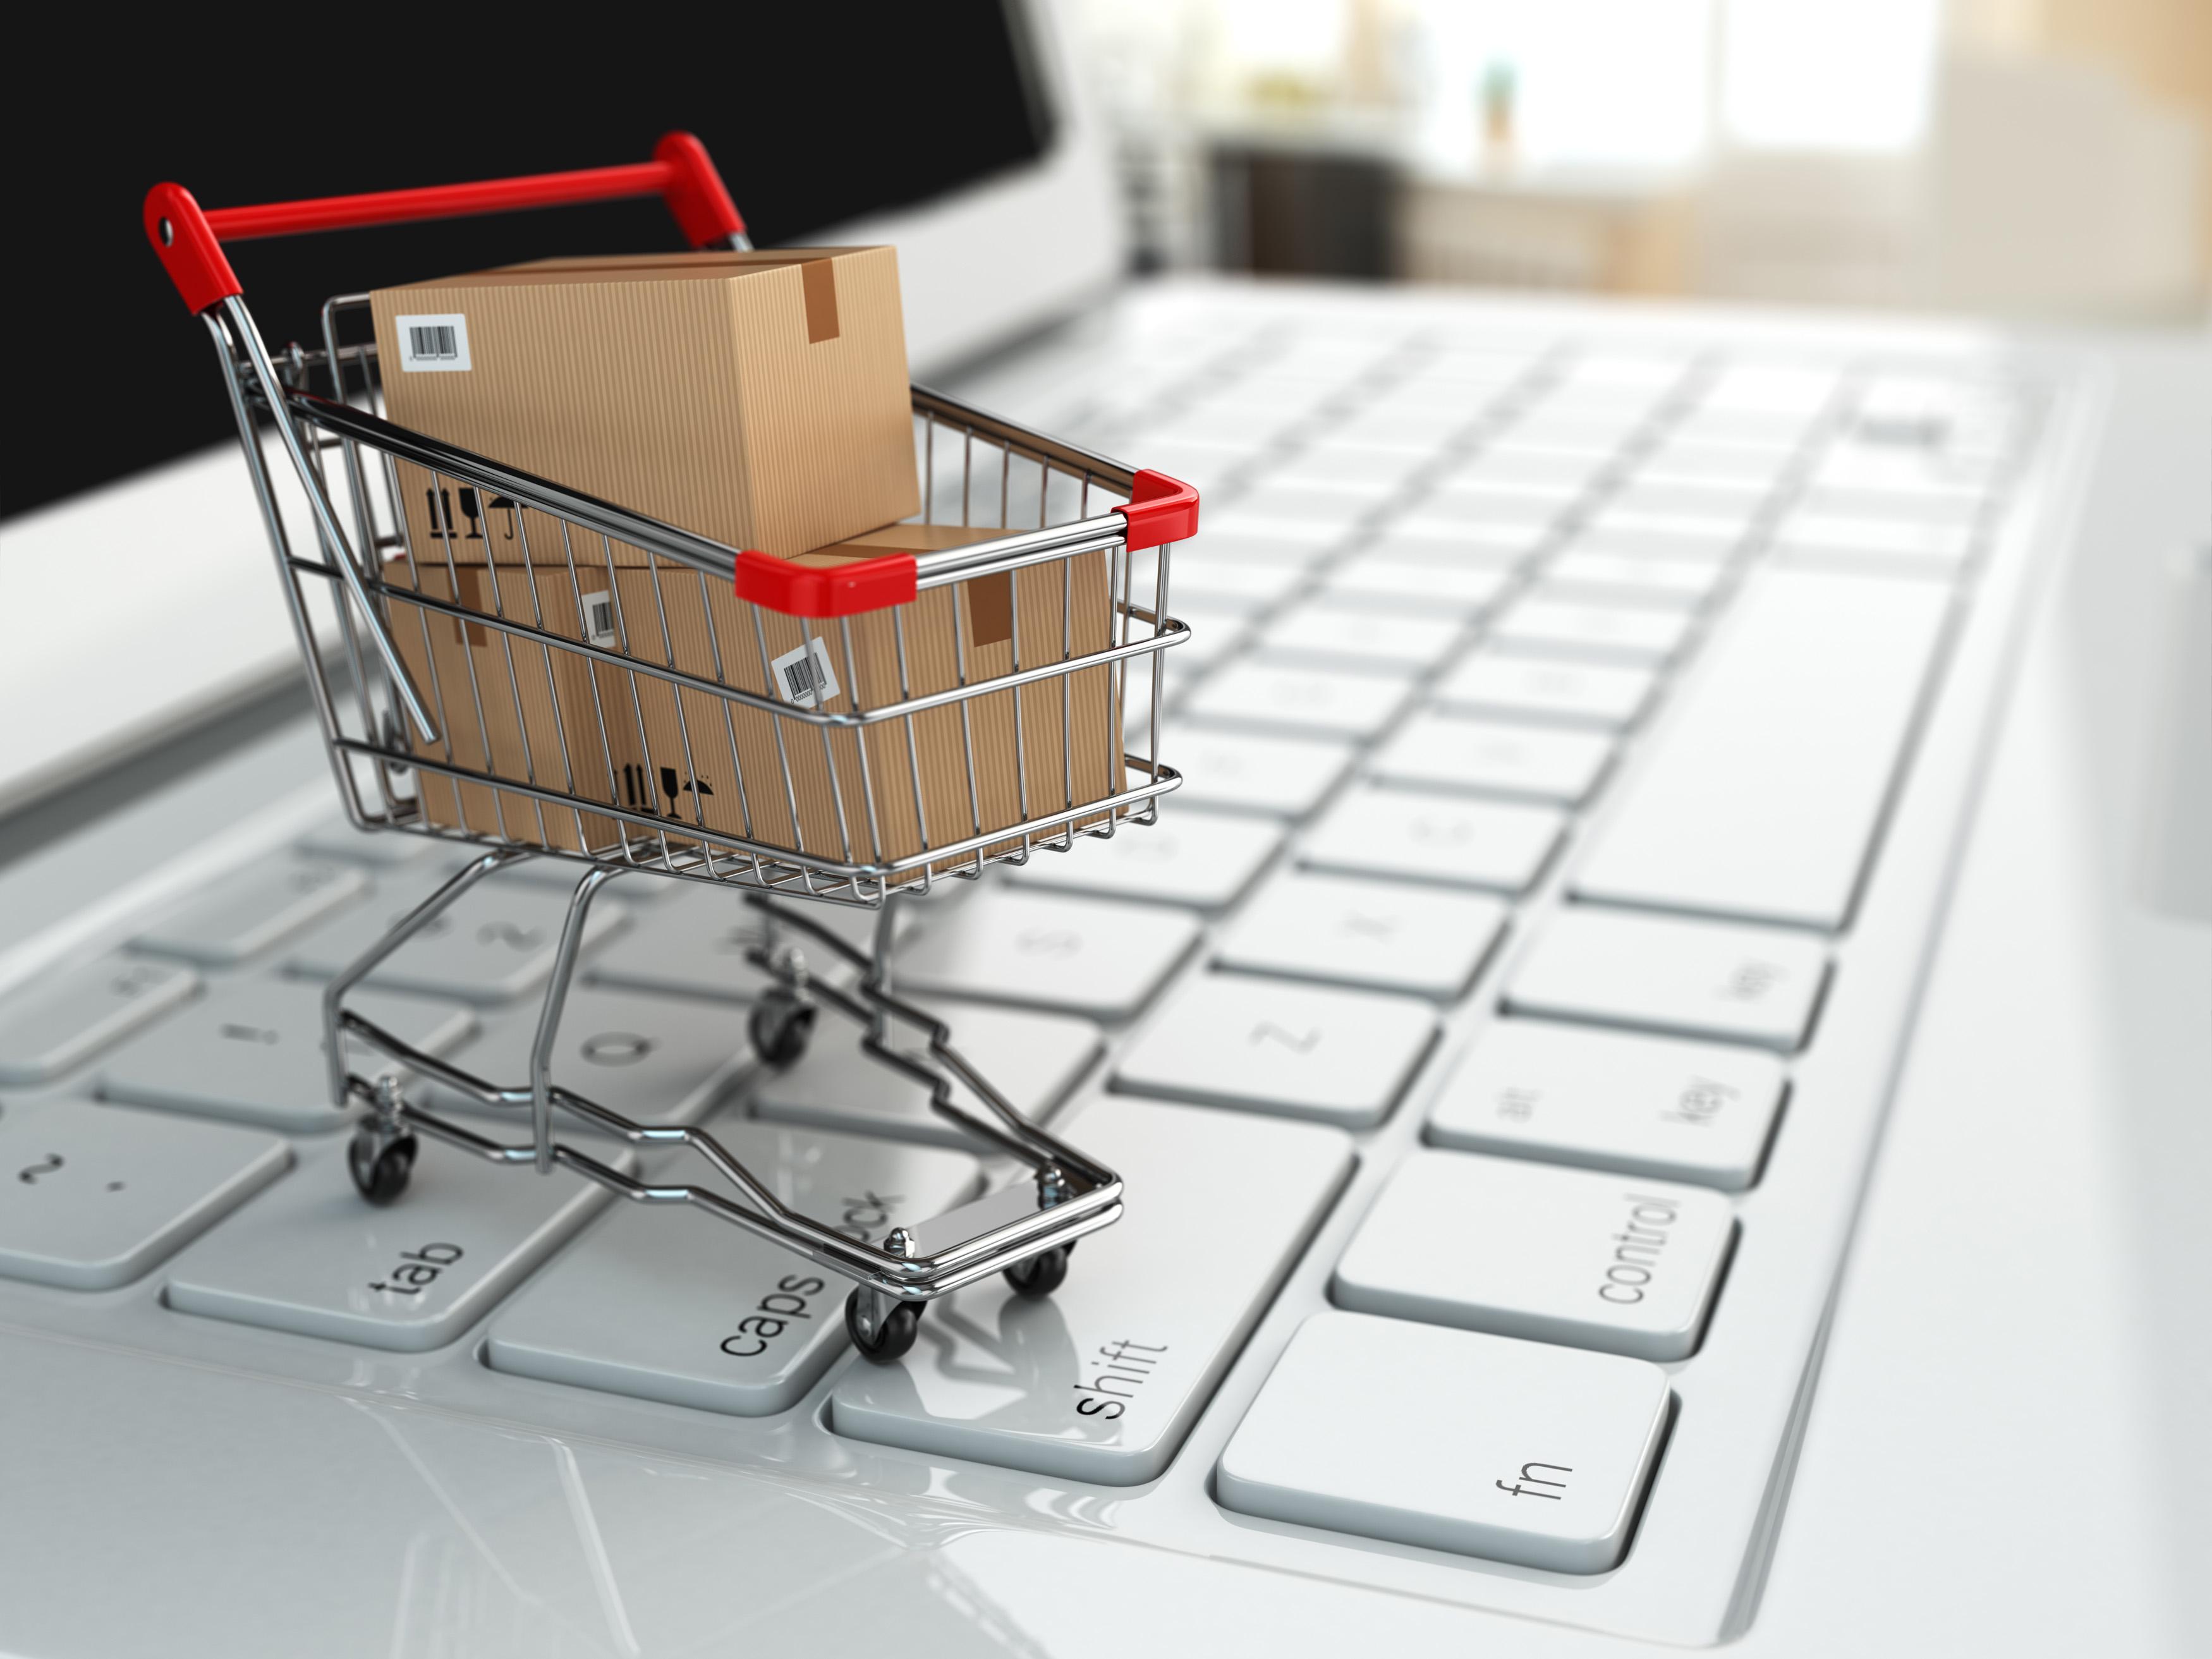 Tutela dei consumatori in rete (c) shutterstock